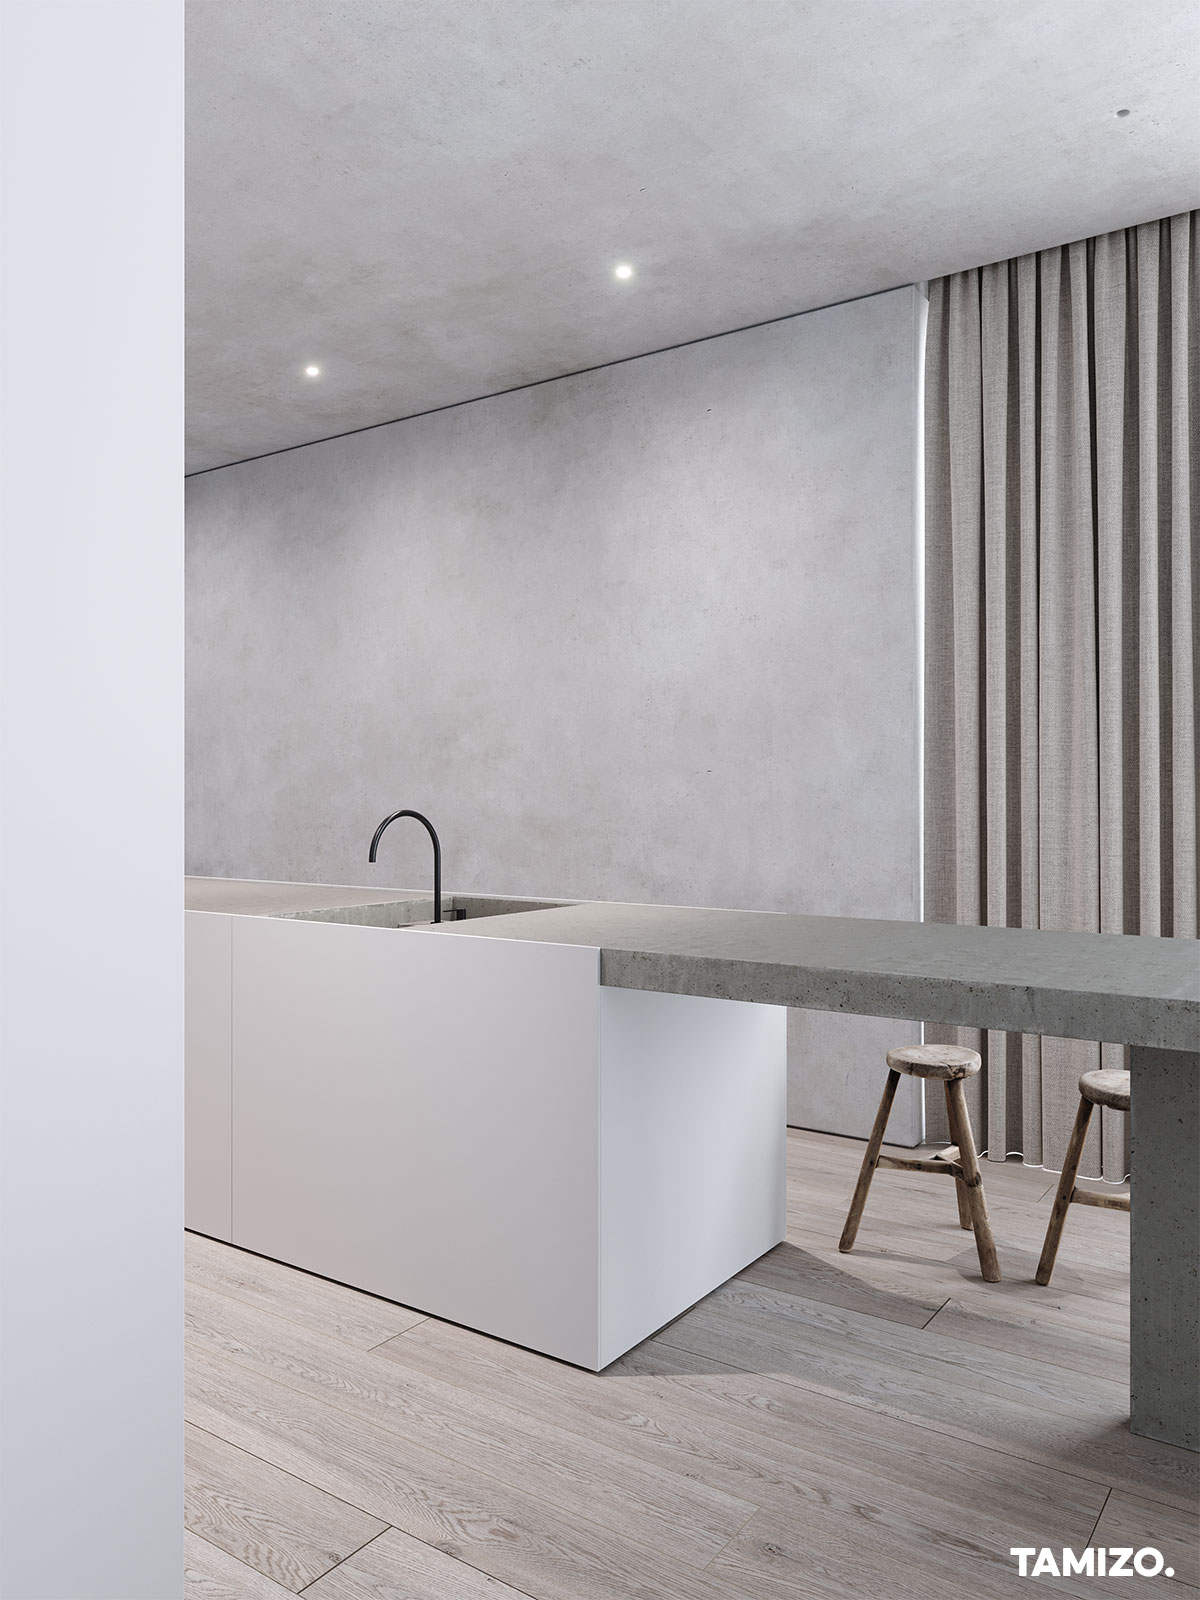 tamizo_architects_mateusz_kuo_stolarski_warszawa_iterior_design_house_minimal_04